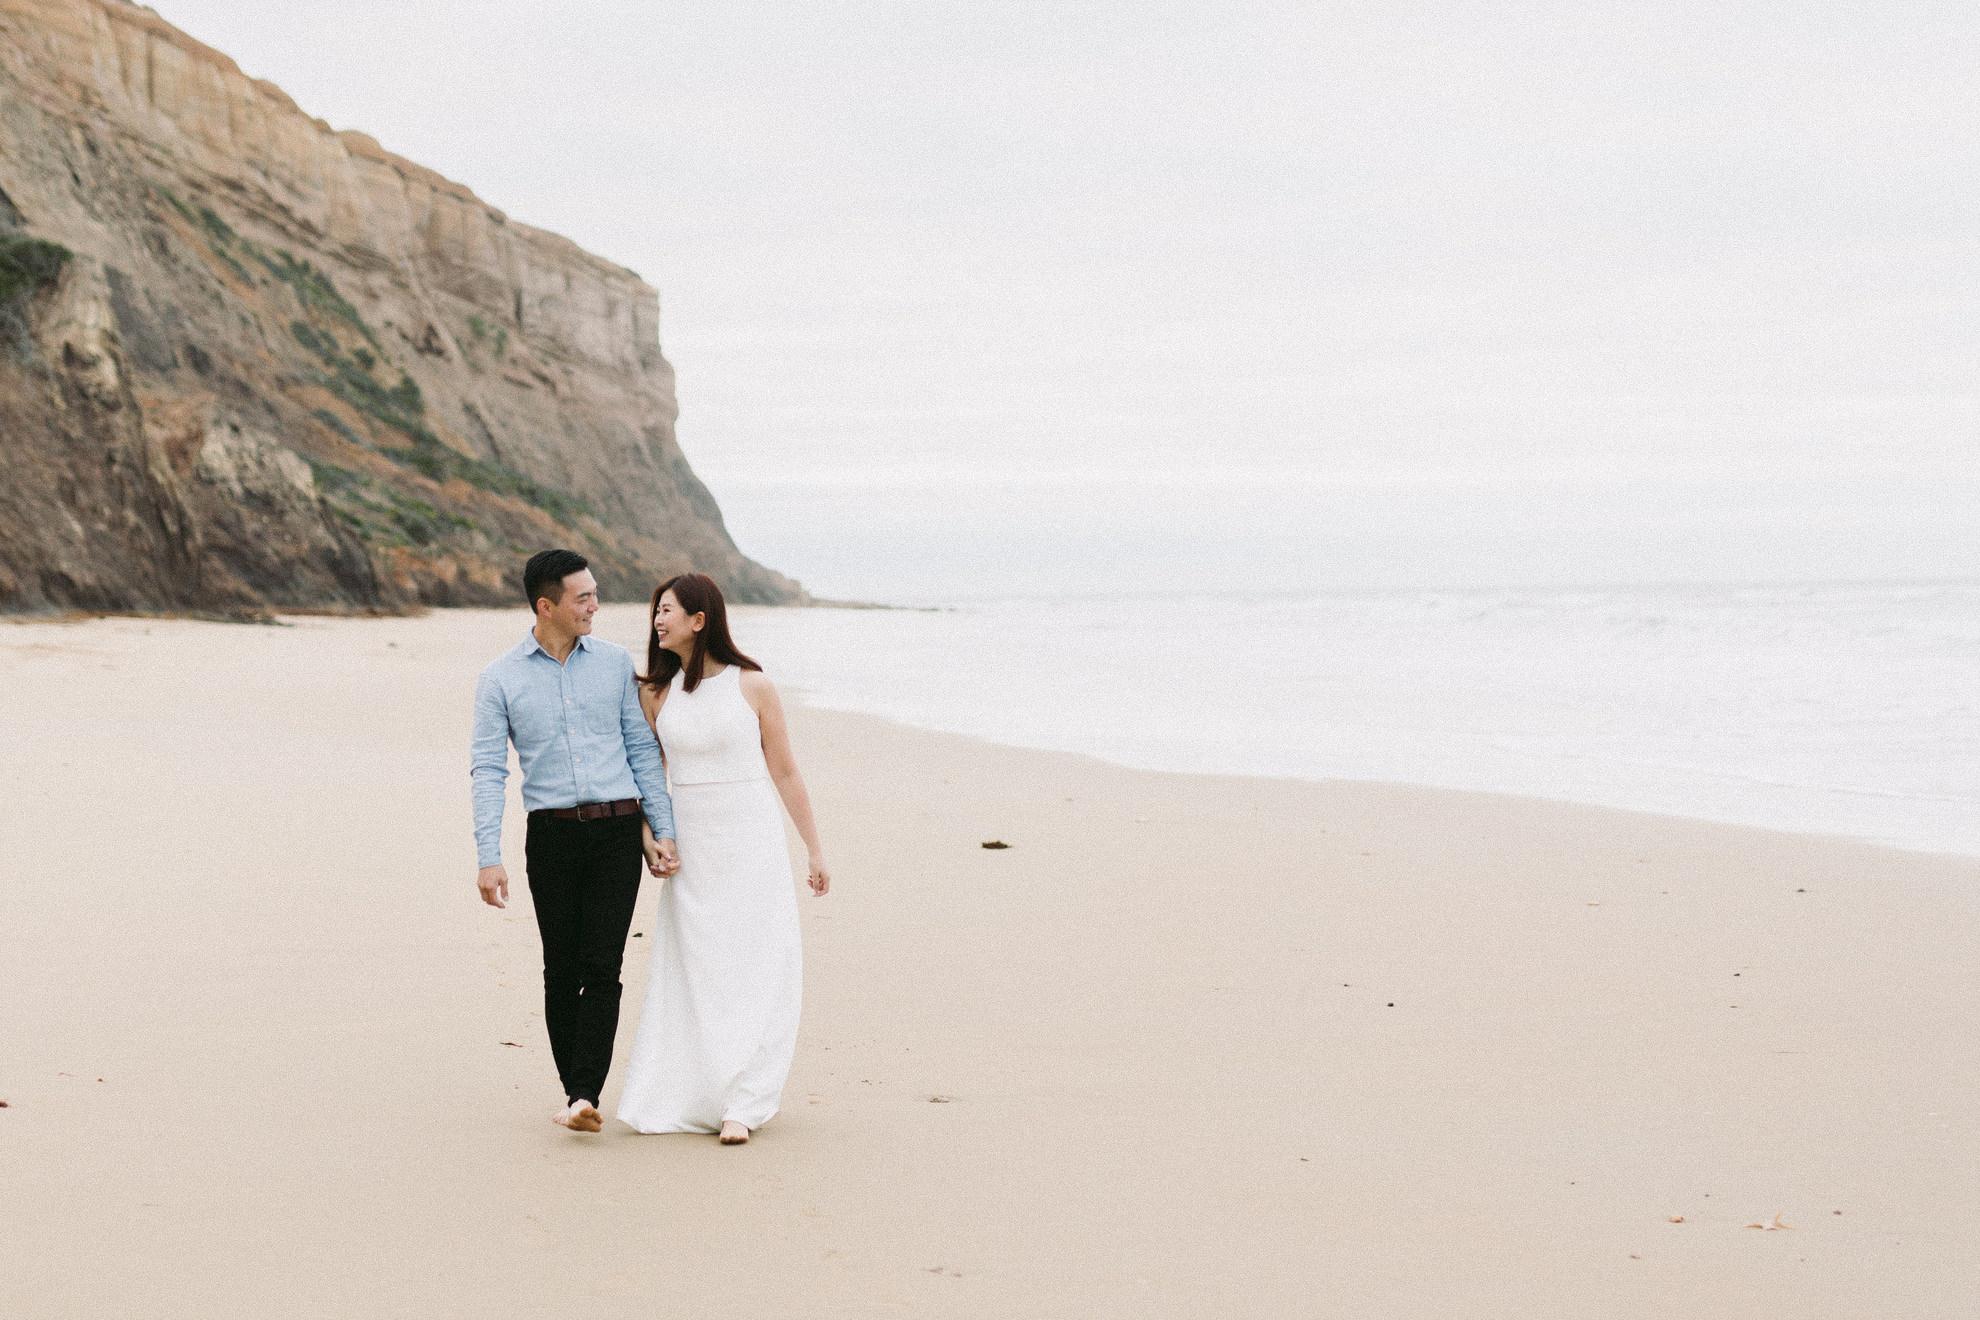 Mornington Peninsula Lorne Torquay Engagement Photographer (a1 of 11).JPG